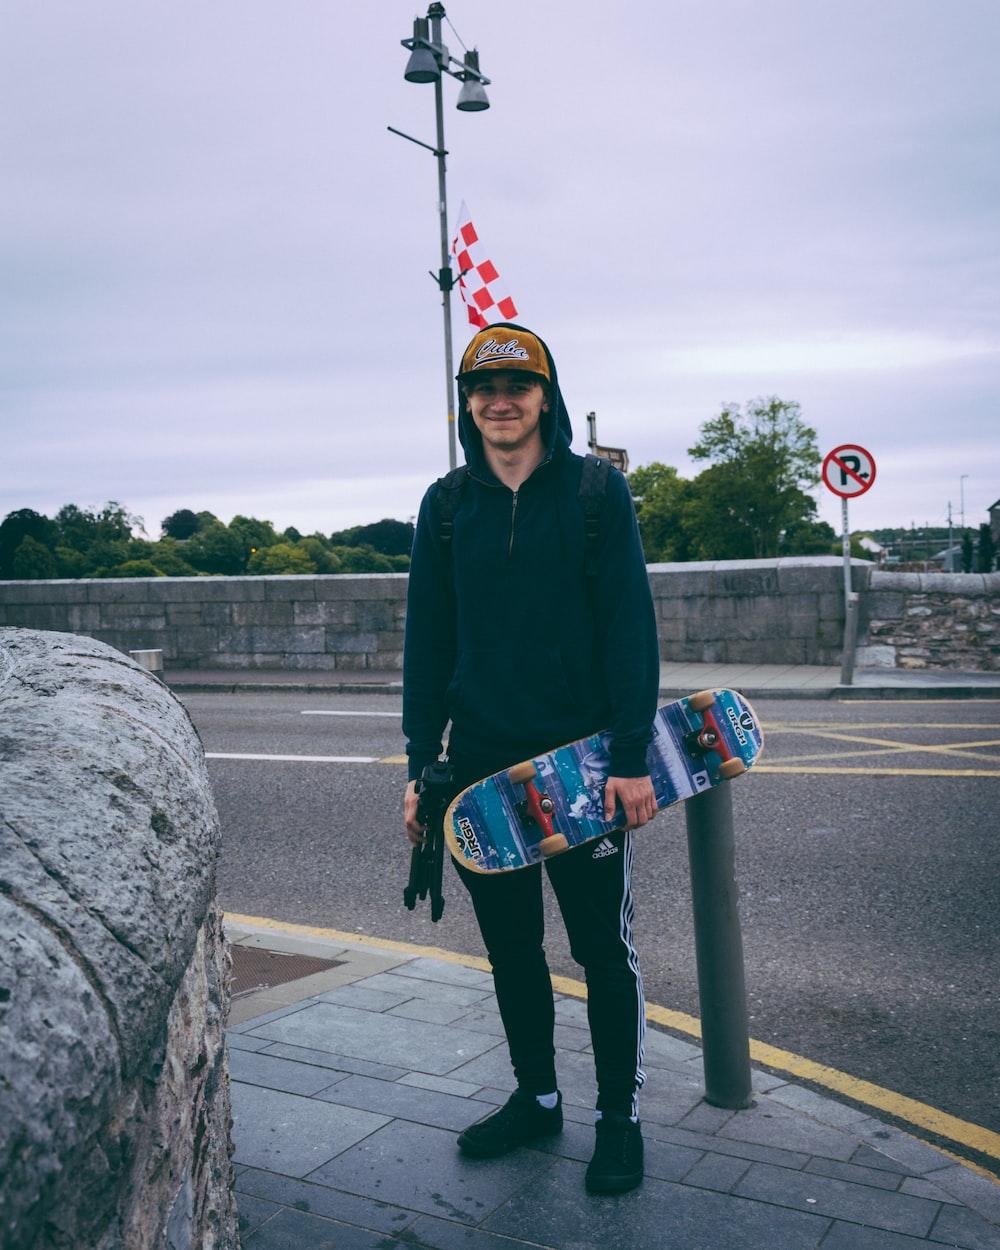 smiling man wearing black hoodie holding skateboard and standing beside bollard across street